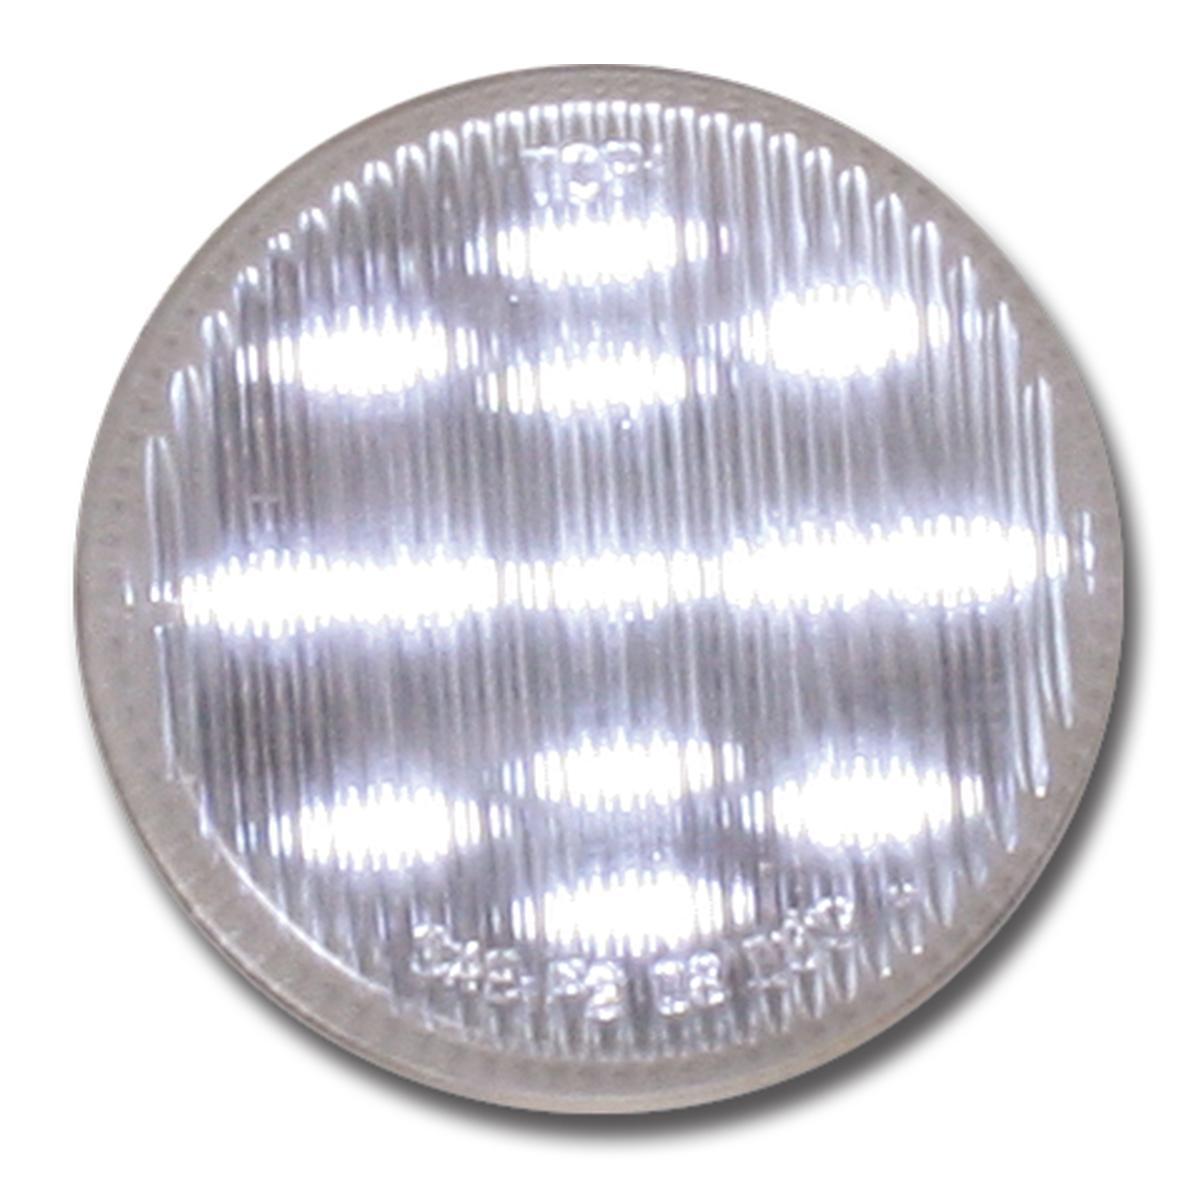 "79319 2-1/2"" Round Fleet Marker Light"